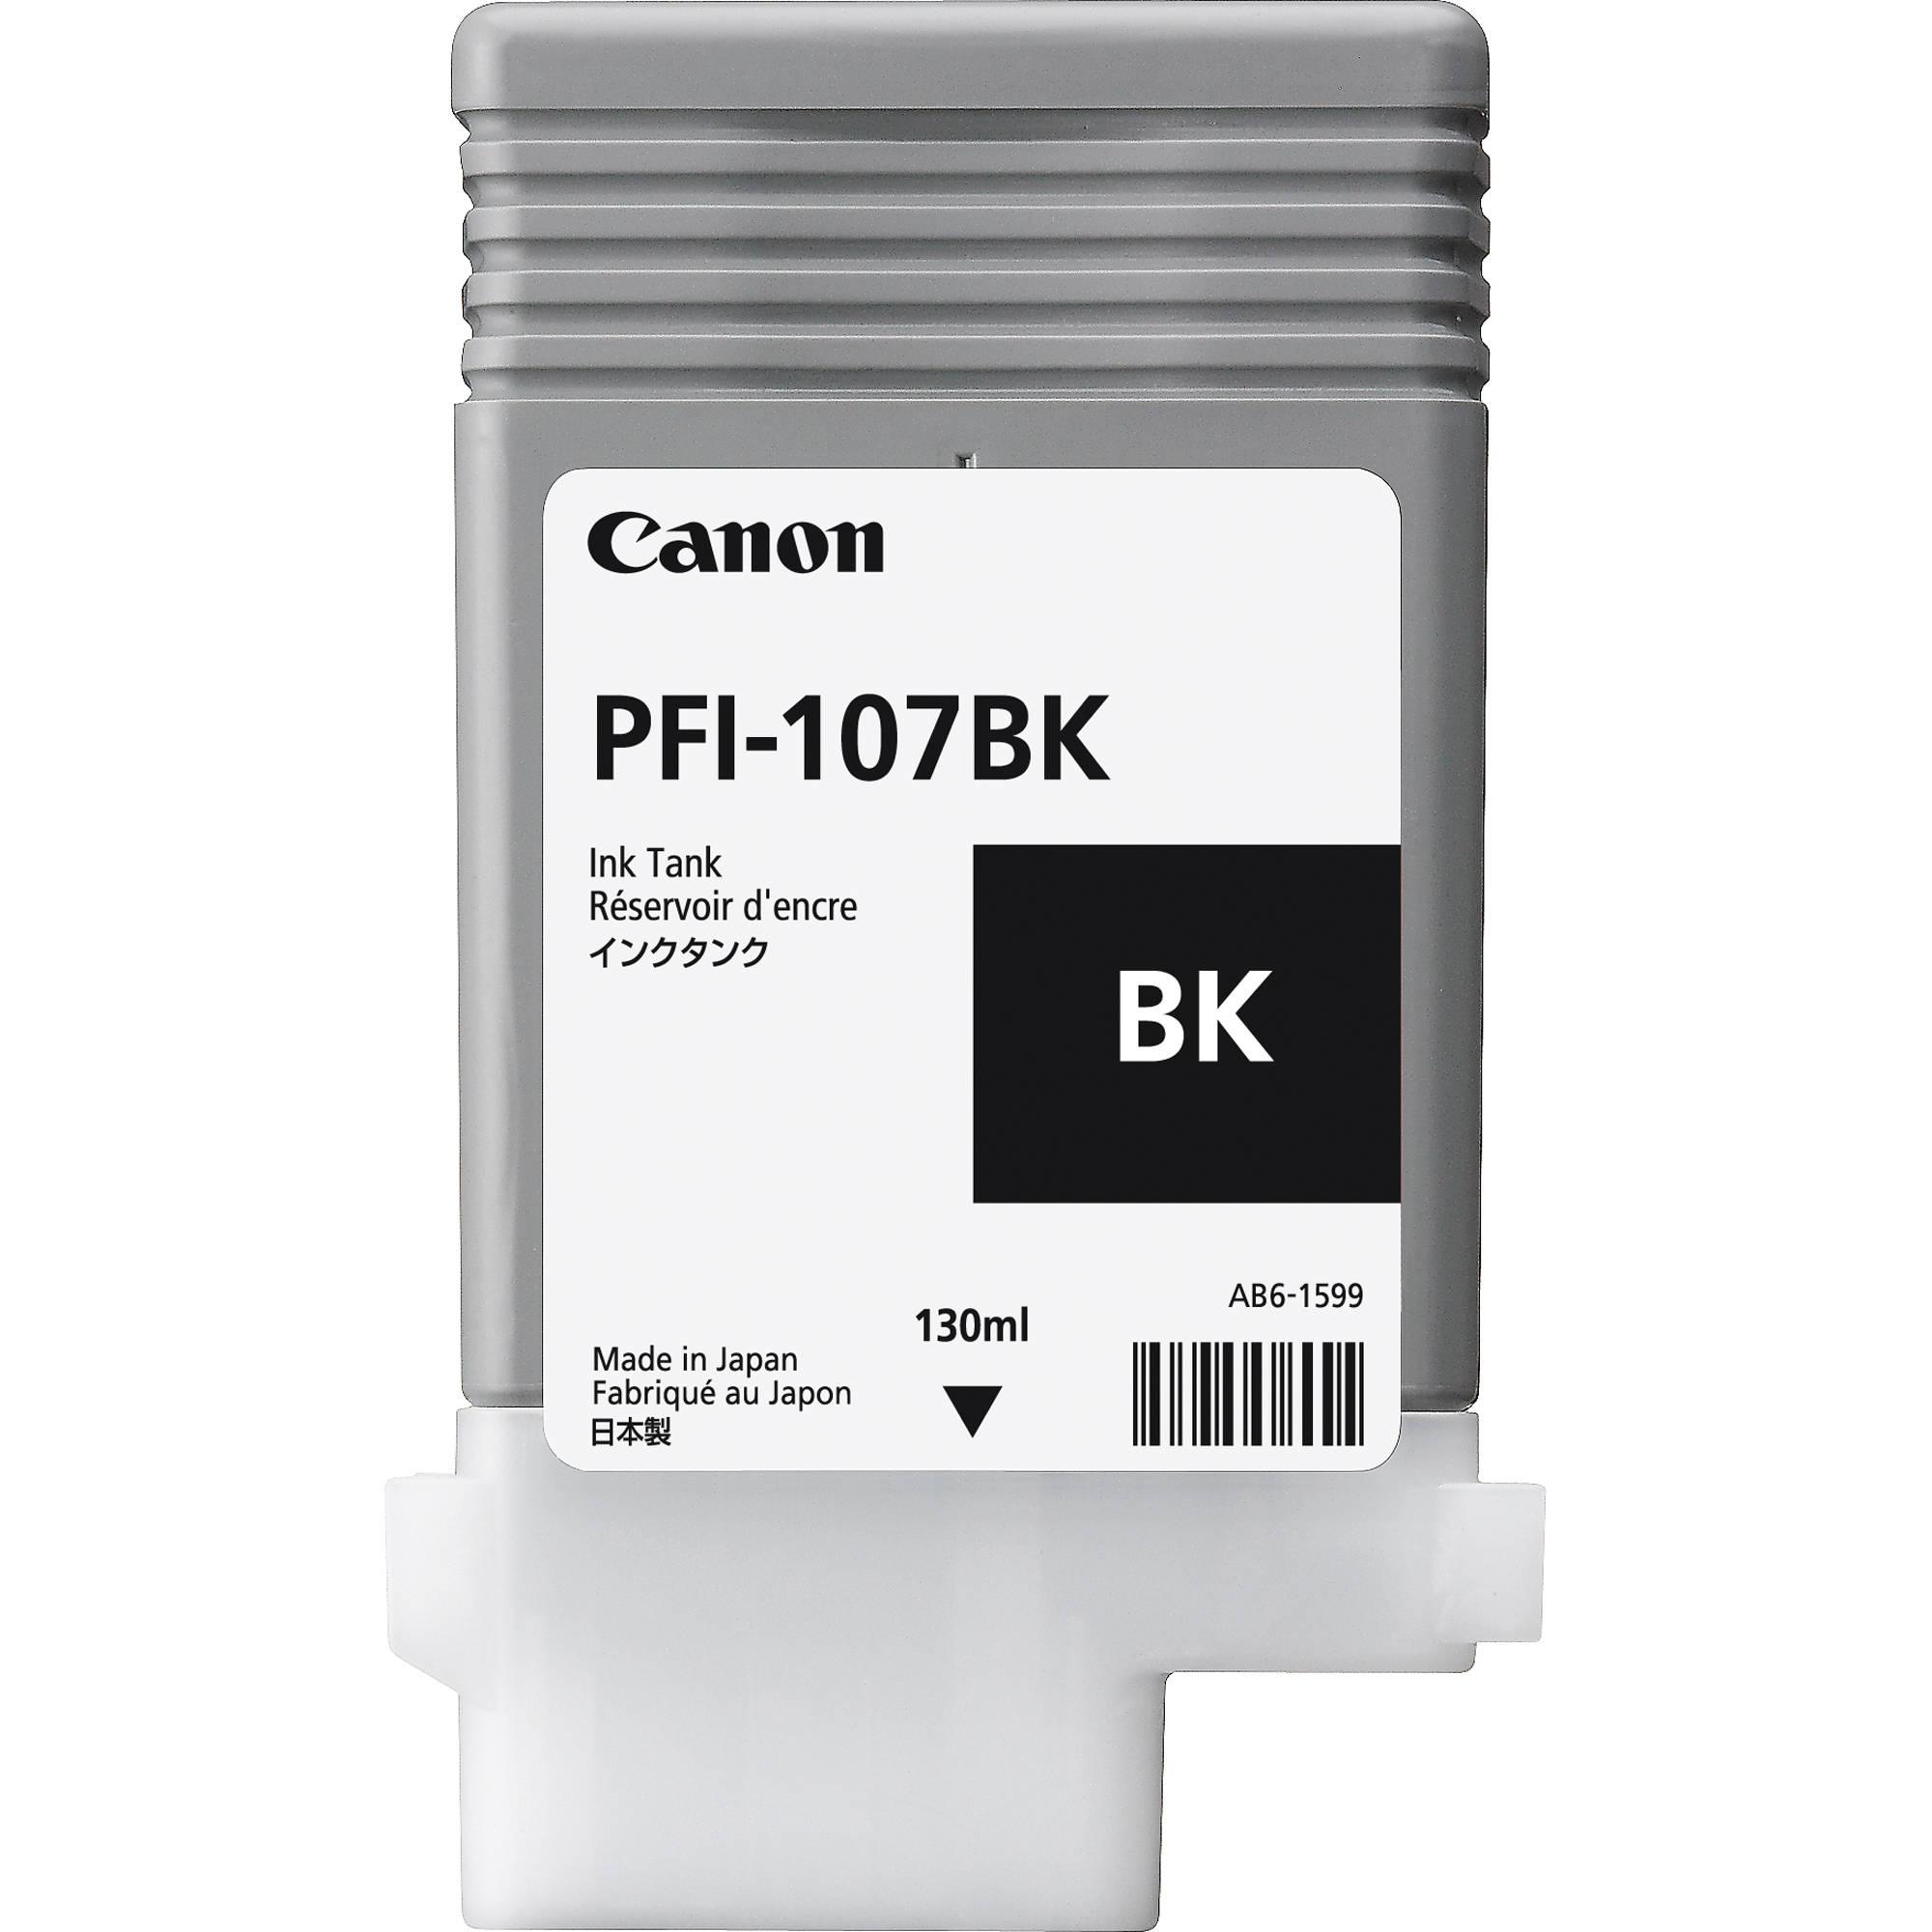 Canon PFI-107BK Black Ink 130ml 6705B001AA